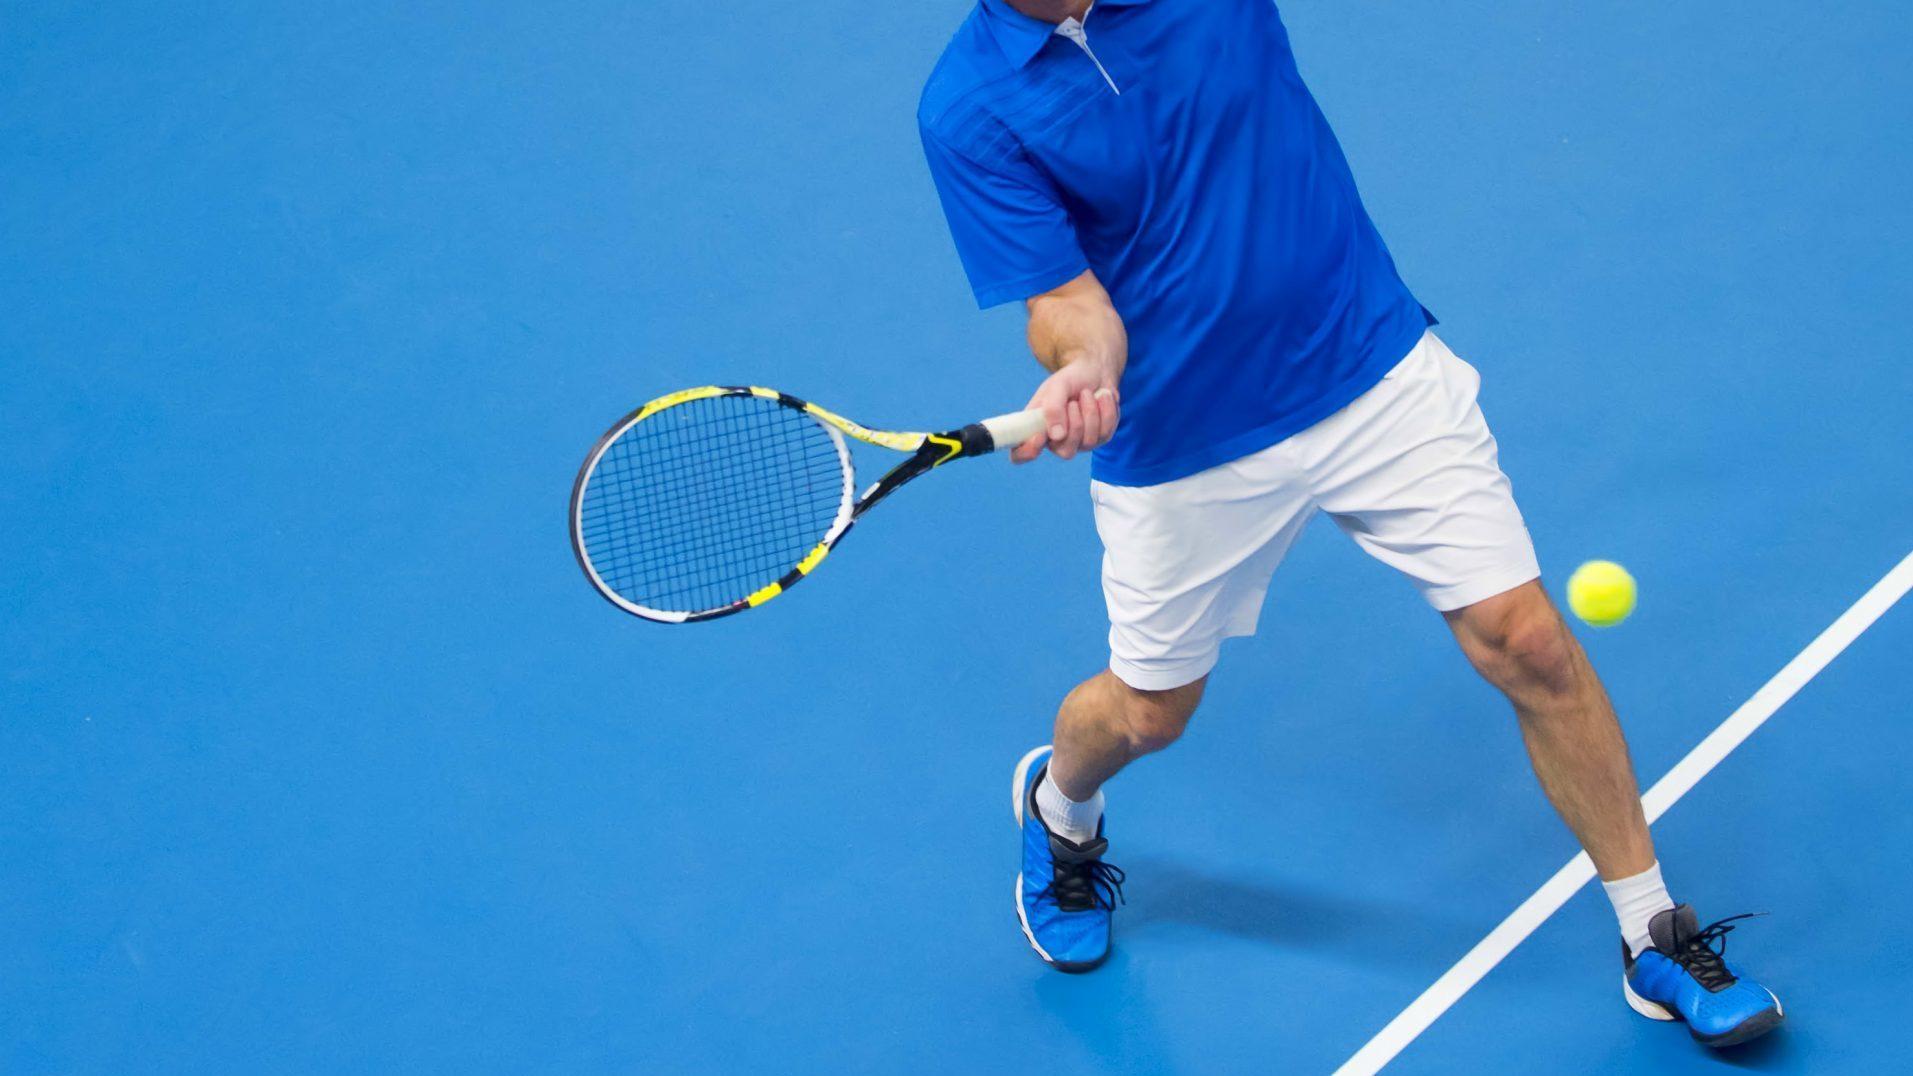 man playing tennis on blue floor